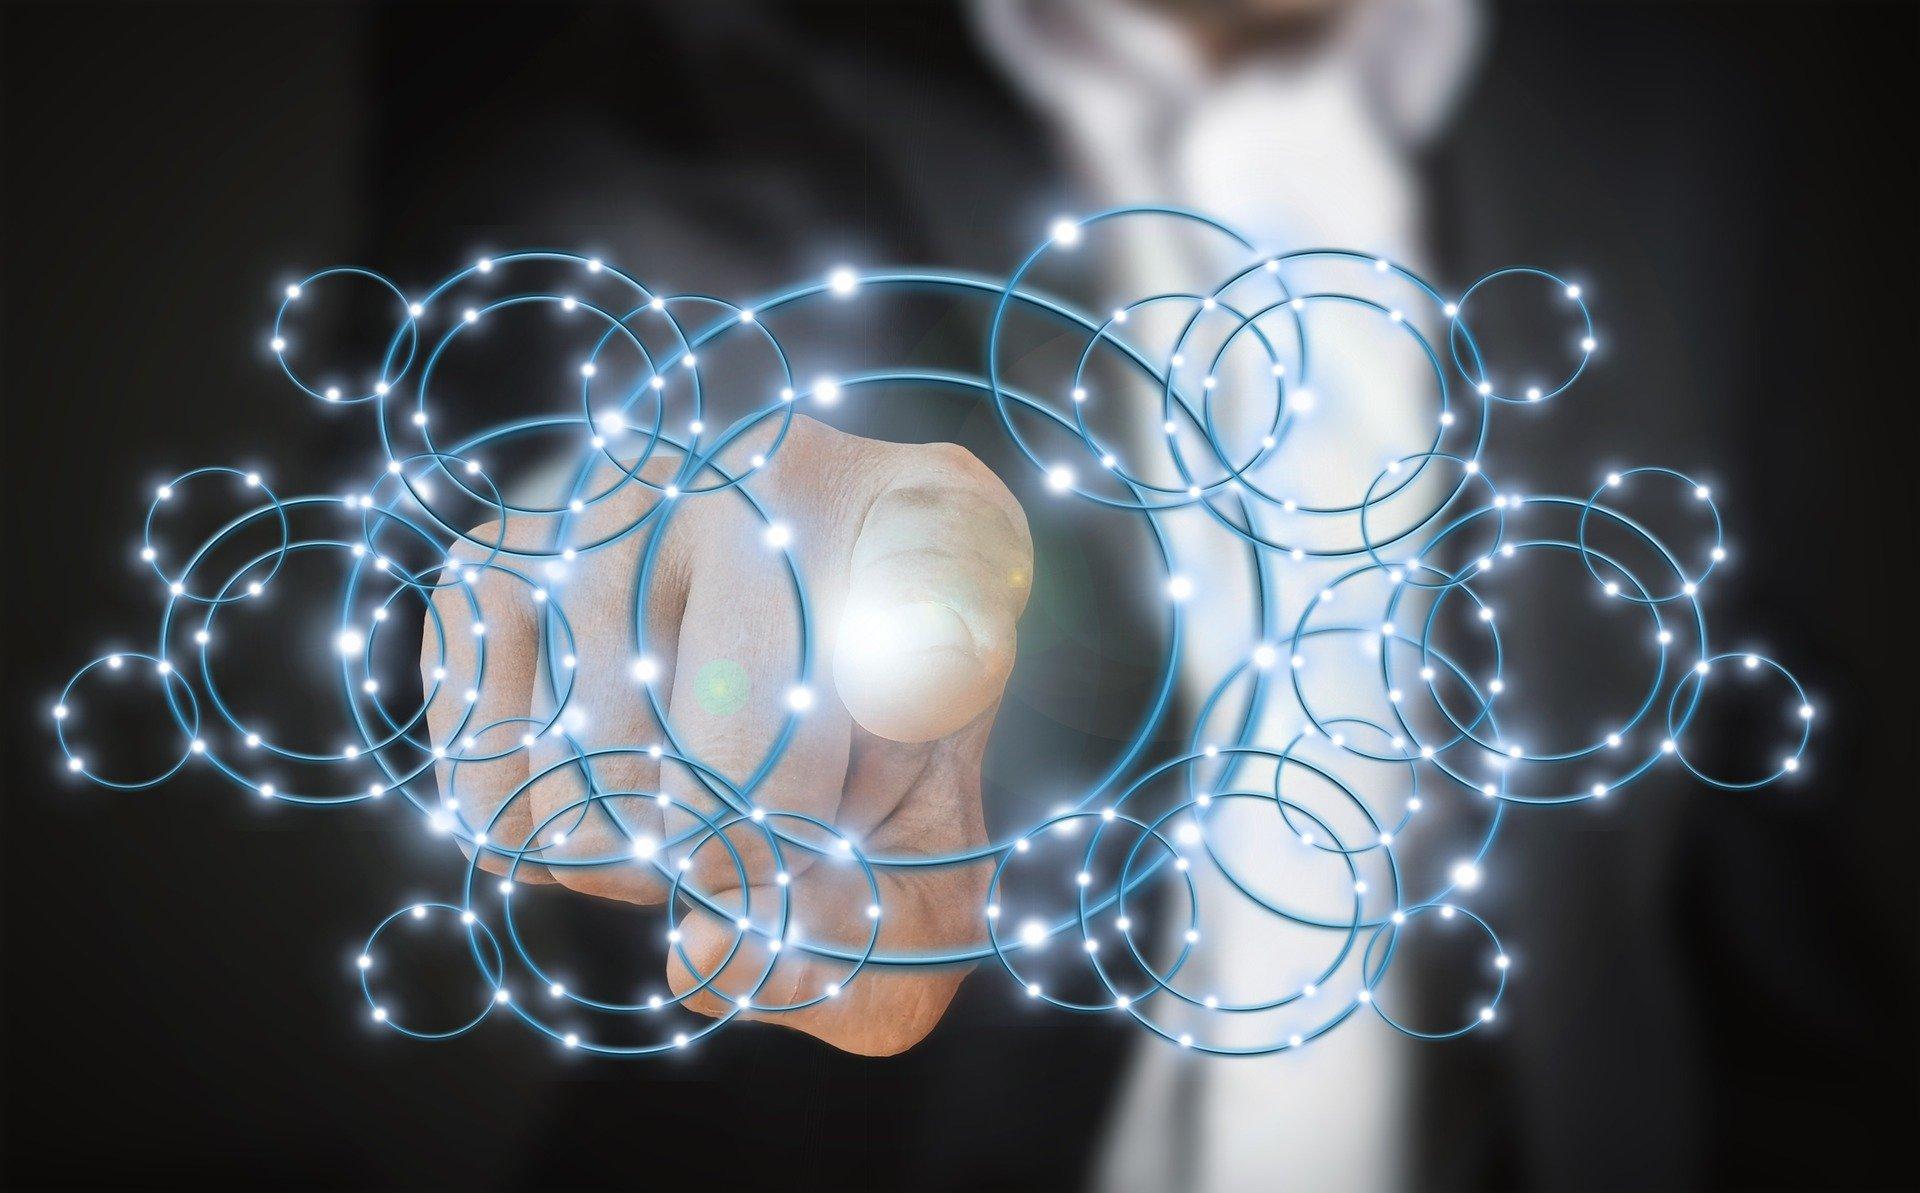 Salesforce Helps Enterprises Drive Loyalty Using AI